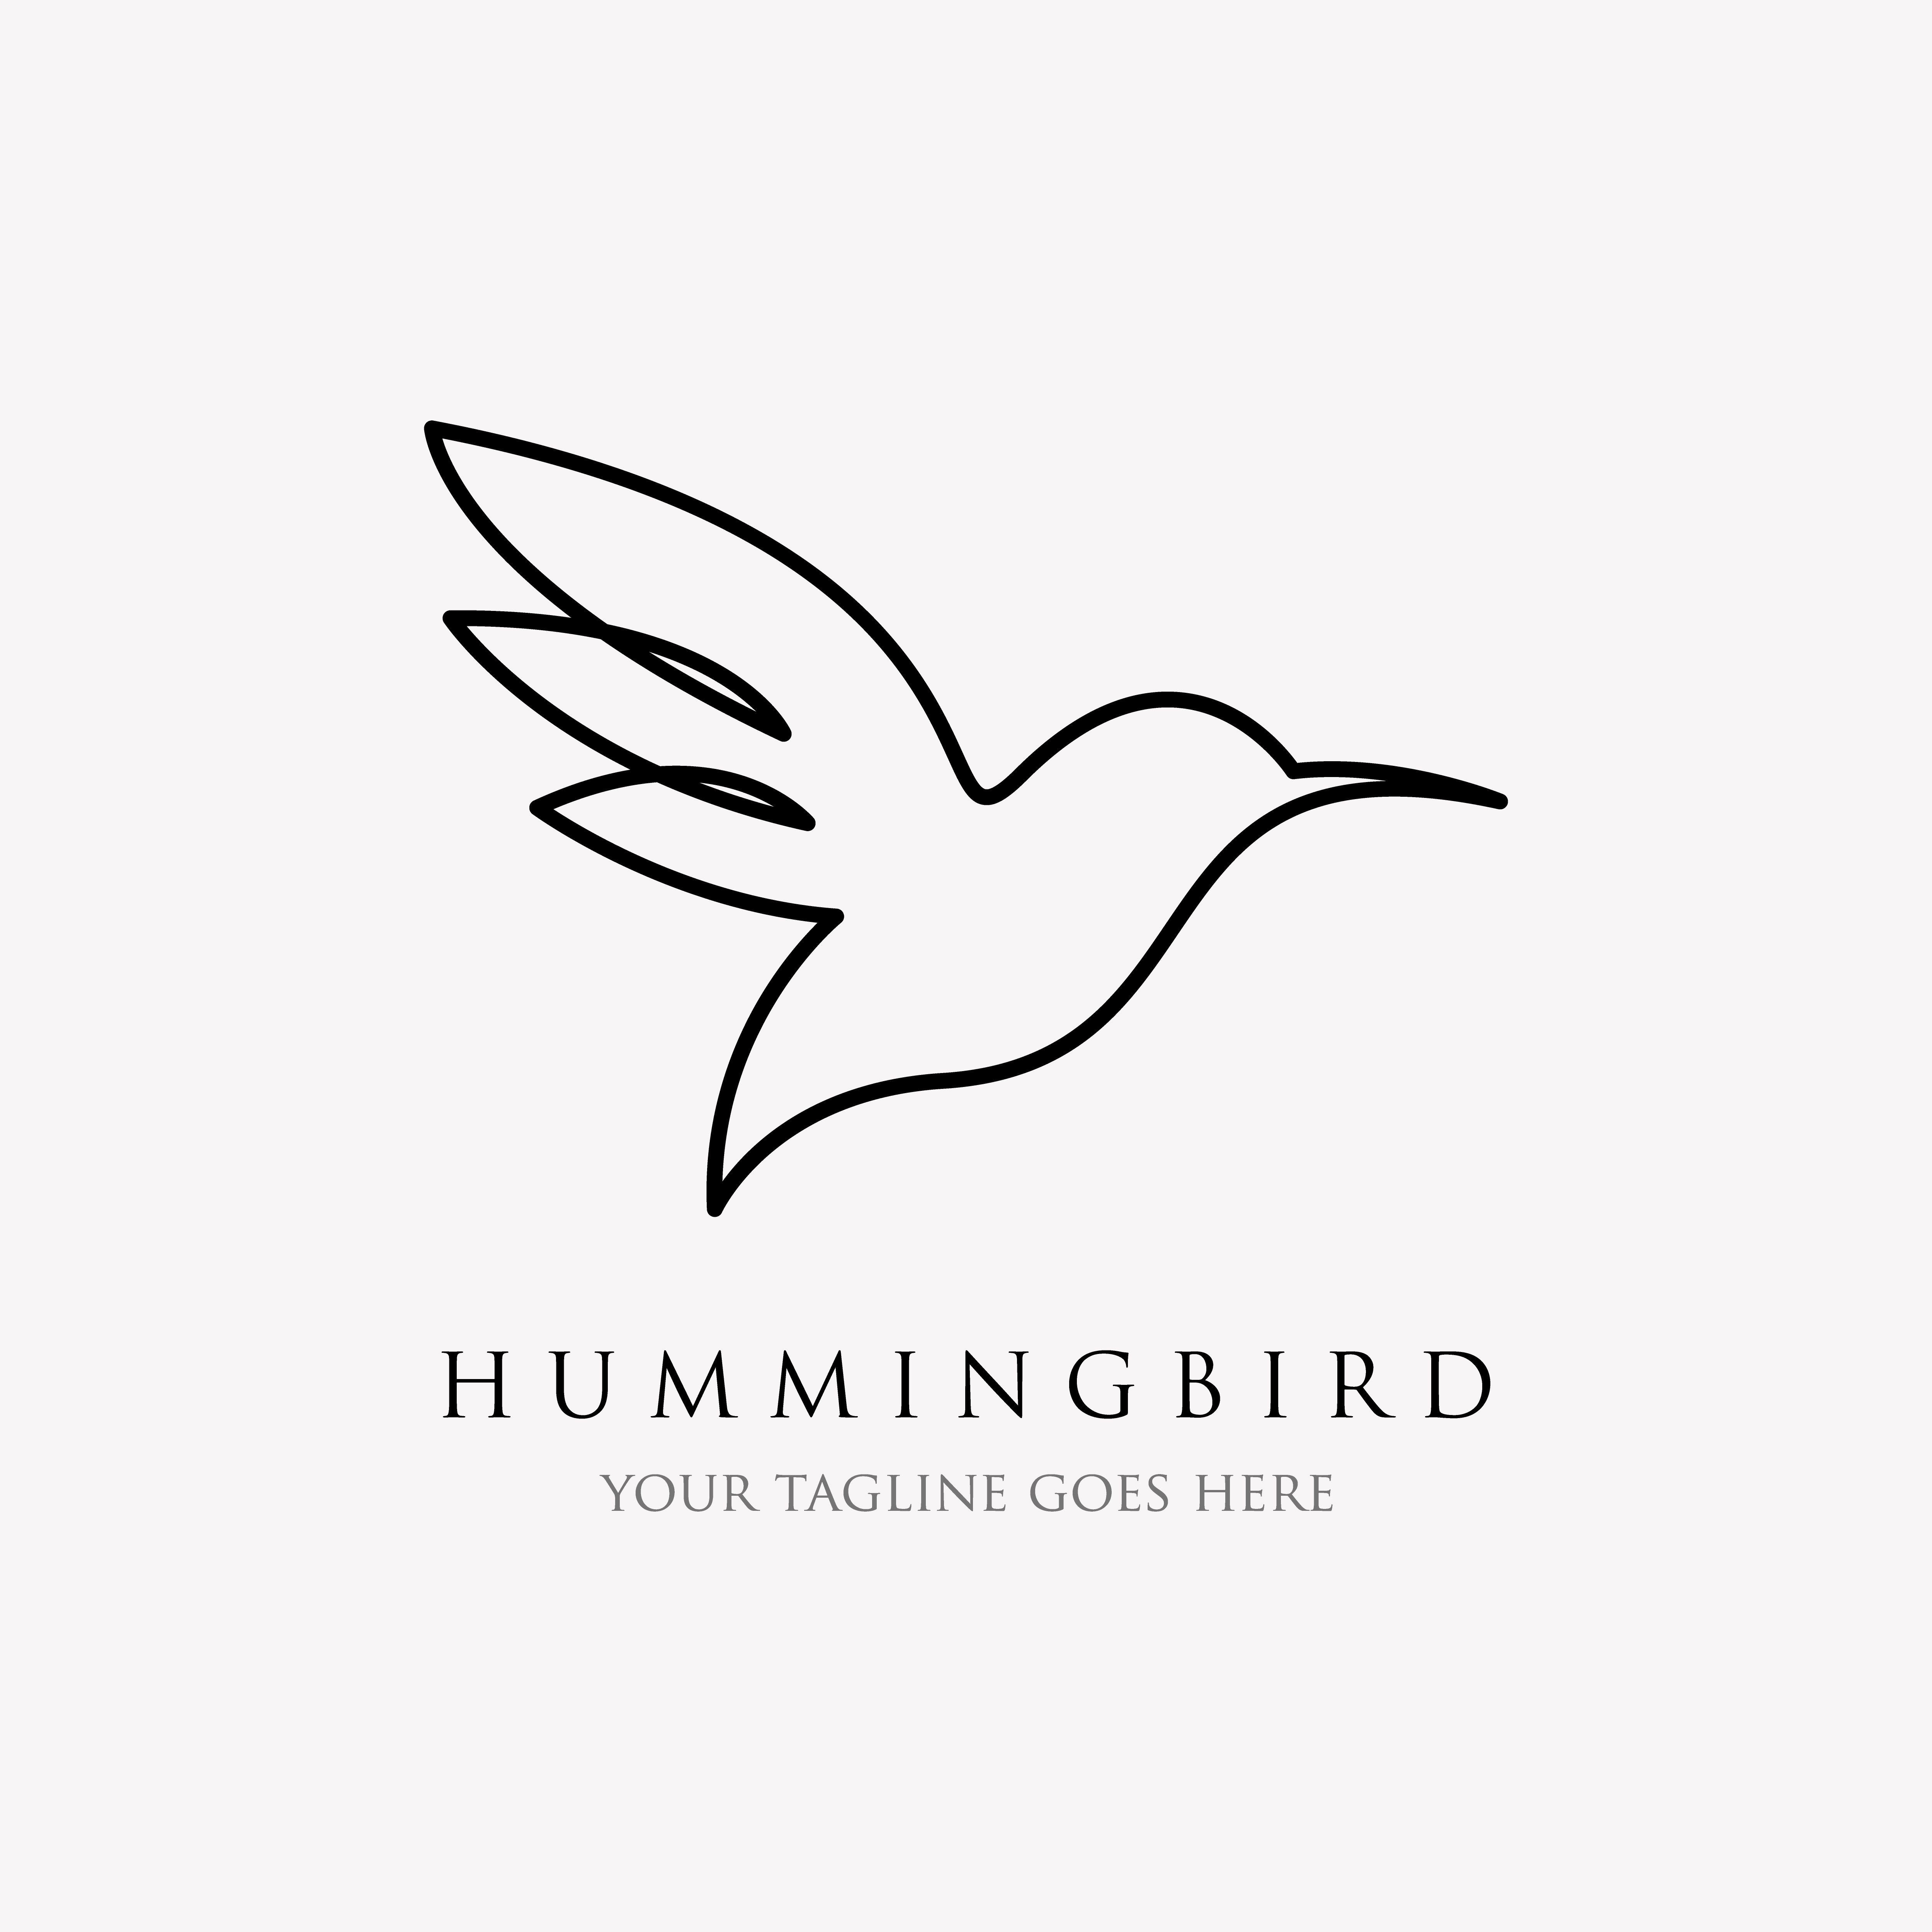 Hummingbird Line Logo Icon Designs Line Art Style And Minimalist By Linimasa Hummingbird Tattoo Black Black And Grey Tattoos Geometric Tattoo Arm